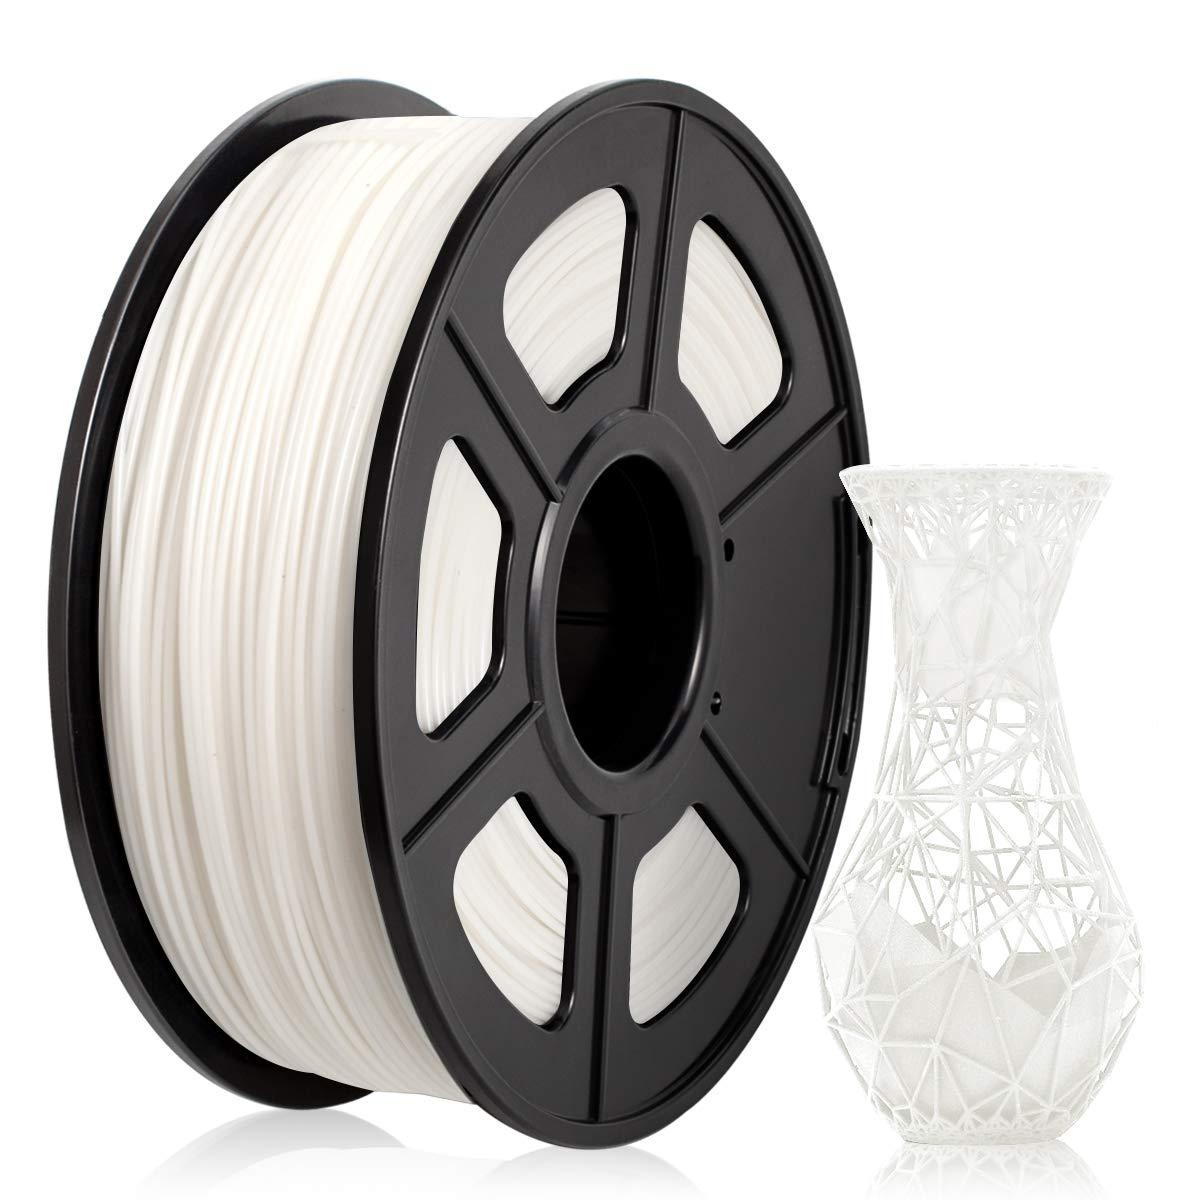 ABS Filament 1.75mm, ABS 3D Printer Filament for 3D Printer 3D Pen, ABS Filament 1KG (2.2 lb) ABS White